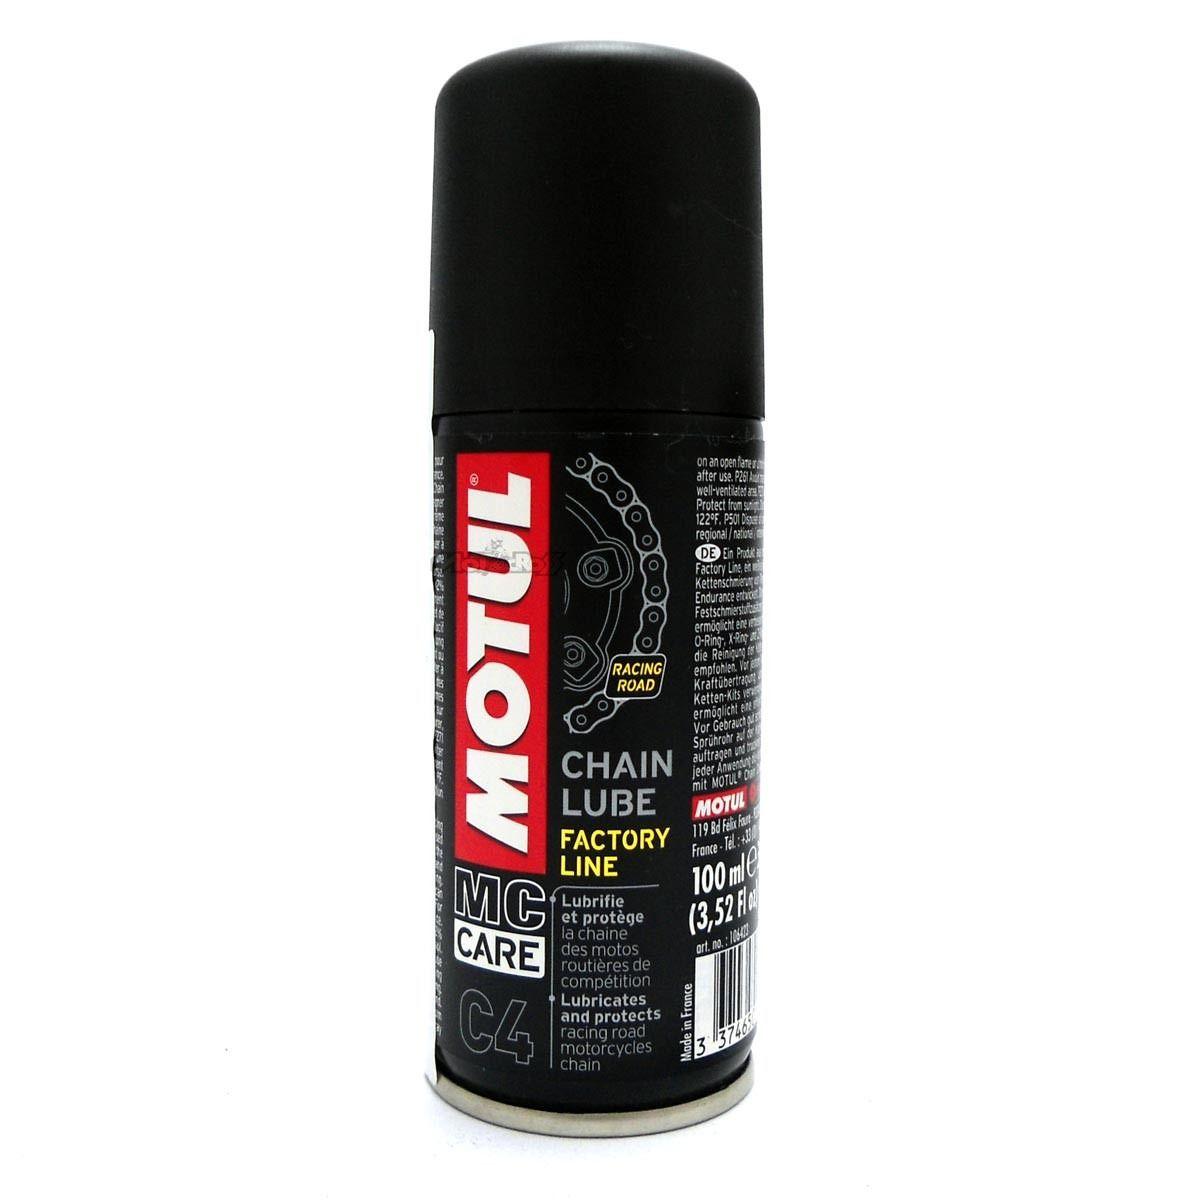 MOTUL - C4 CHAIN LUBE FACTORY LINE 100 ML